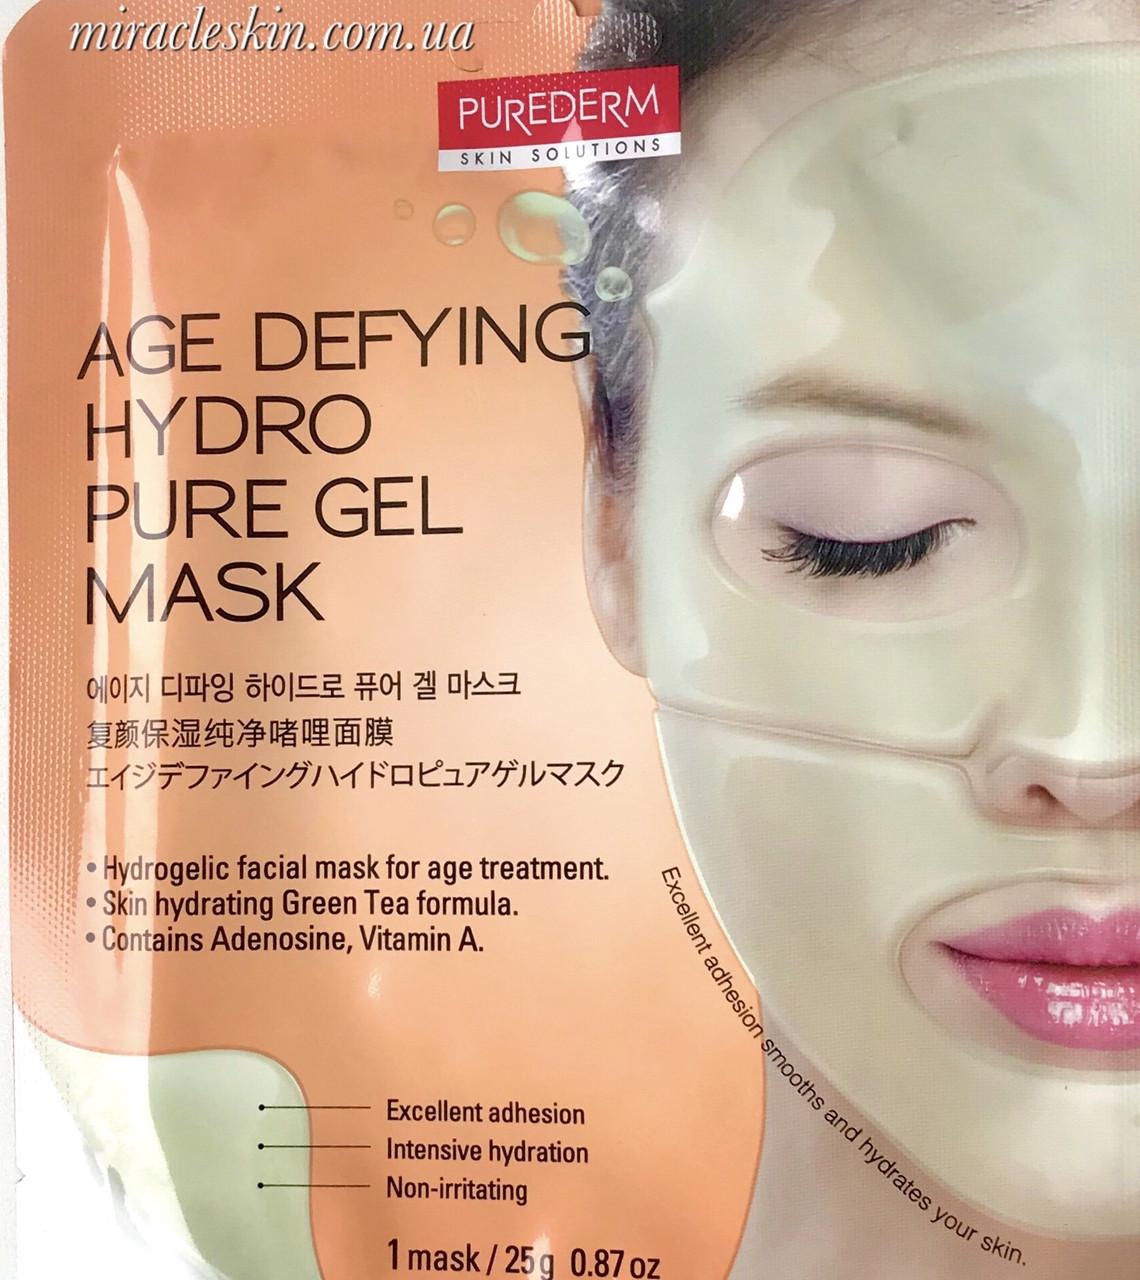 Гидрогелевая антивозрастная маска PUREDERM Age Defying Hydro Pure Gel Mask, 1шт